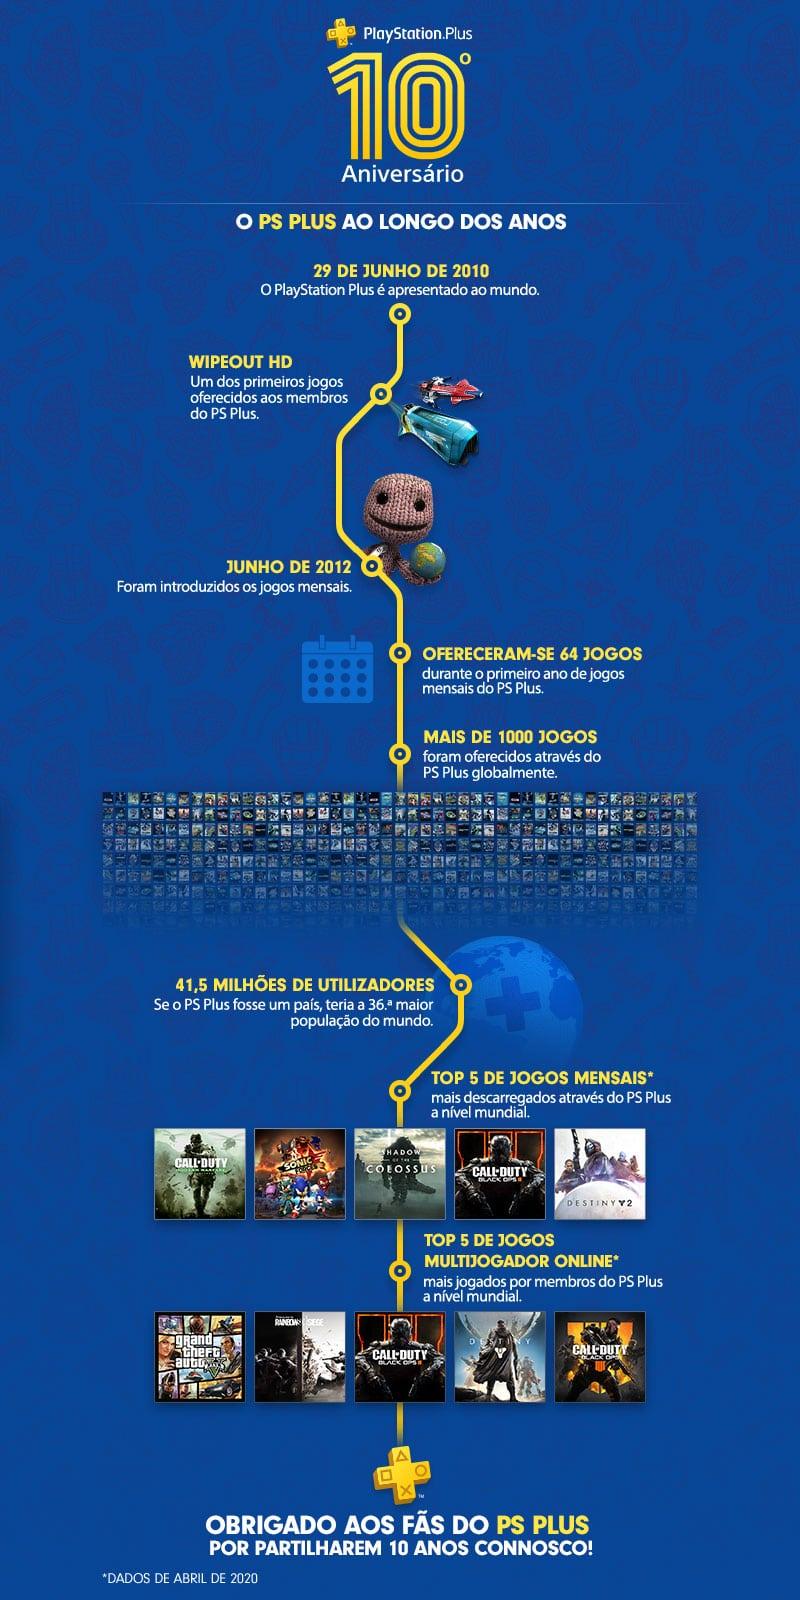 PlayStation Plus - 10 anos